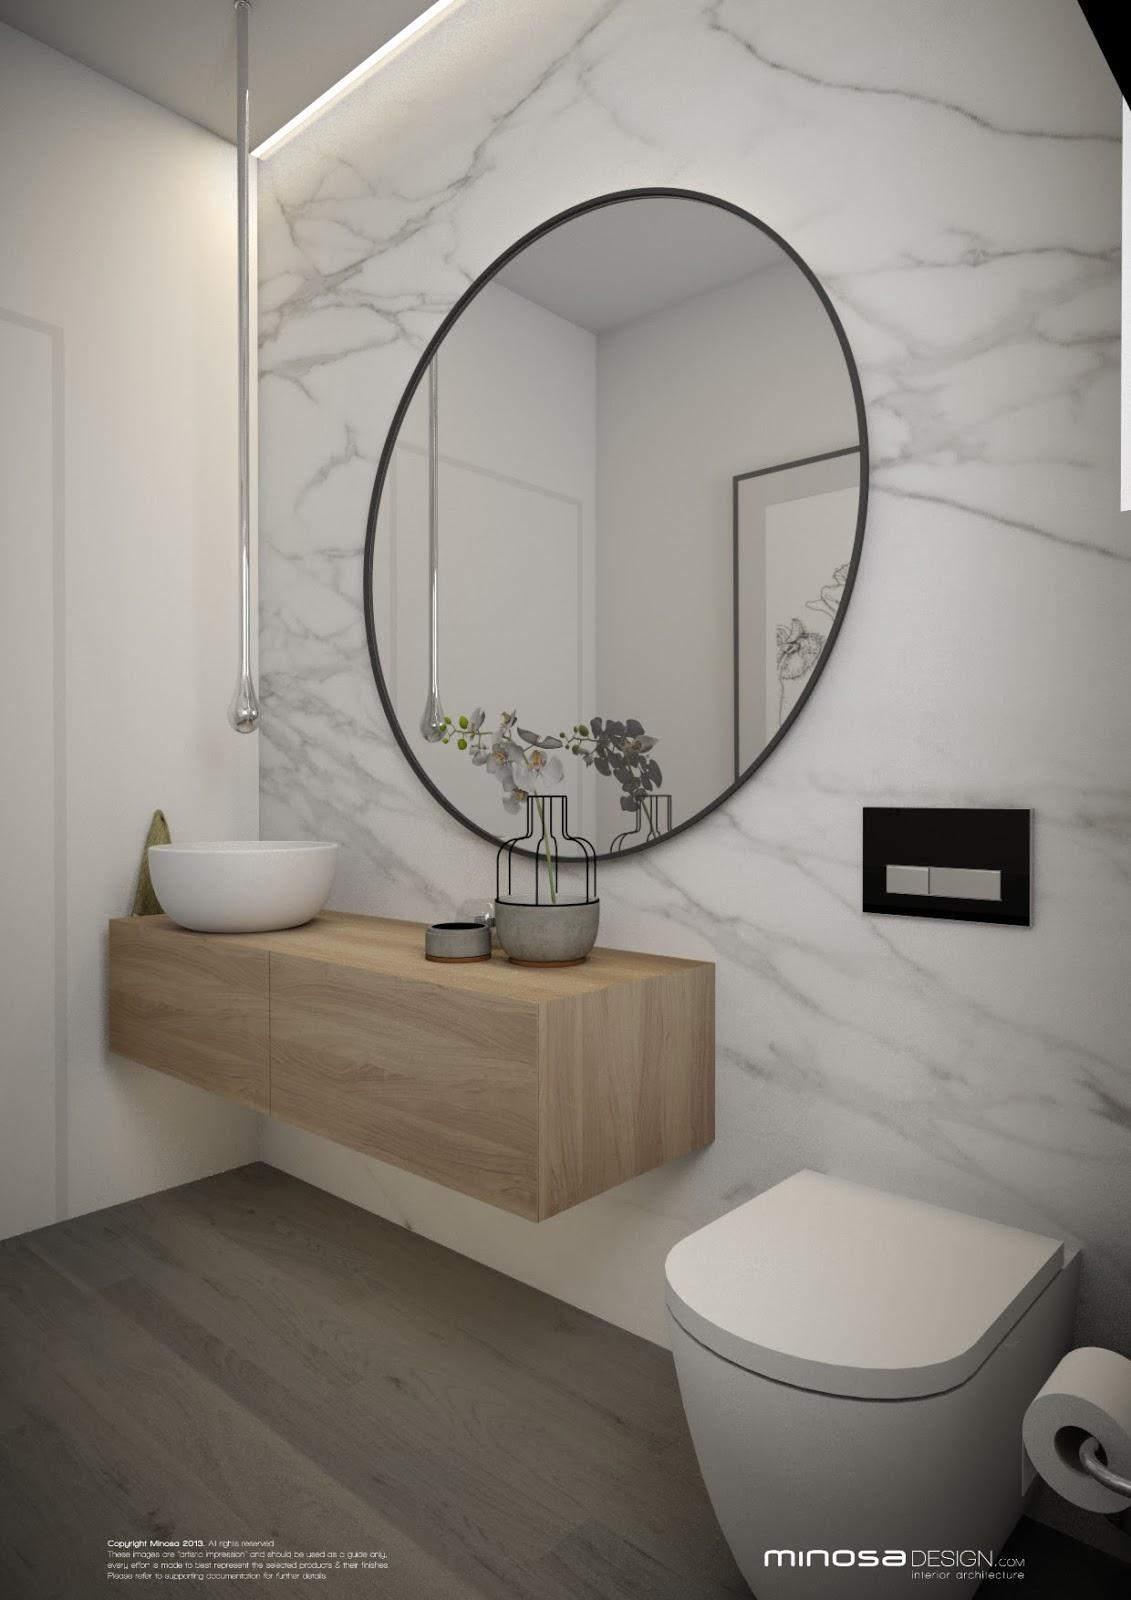 minosa powder room the wow bathroom. Black Bedroom Furniture Sets. Home Design Ideas